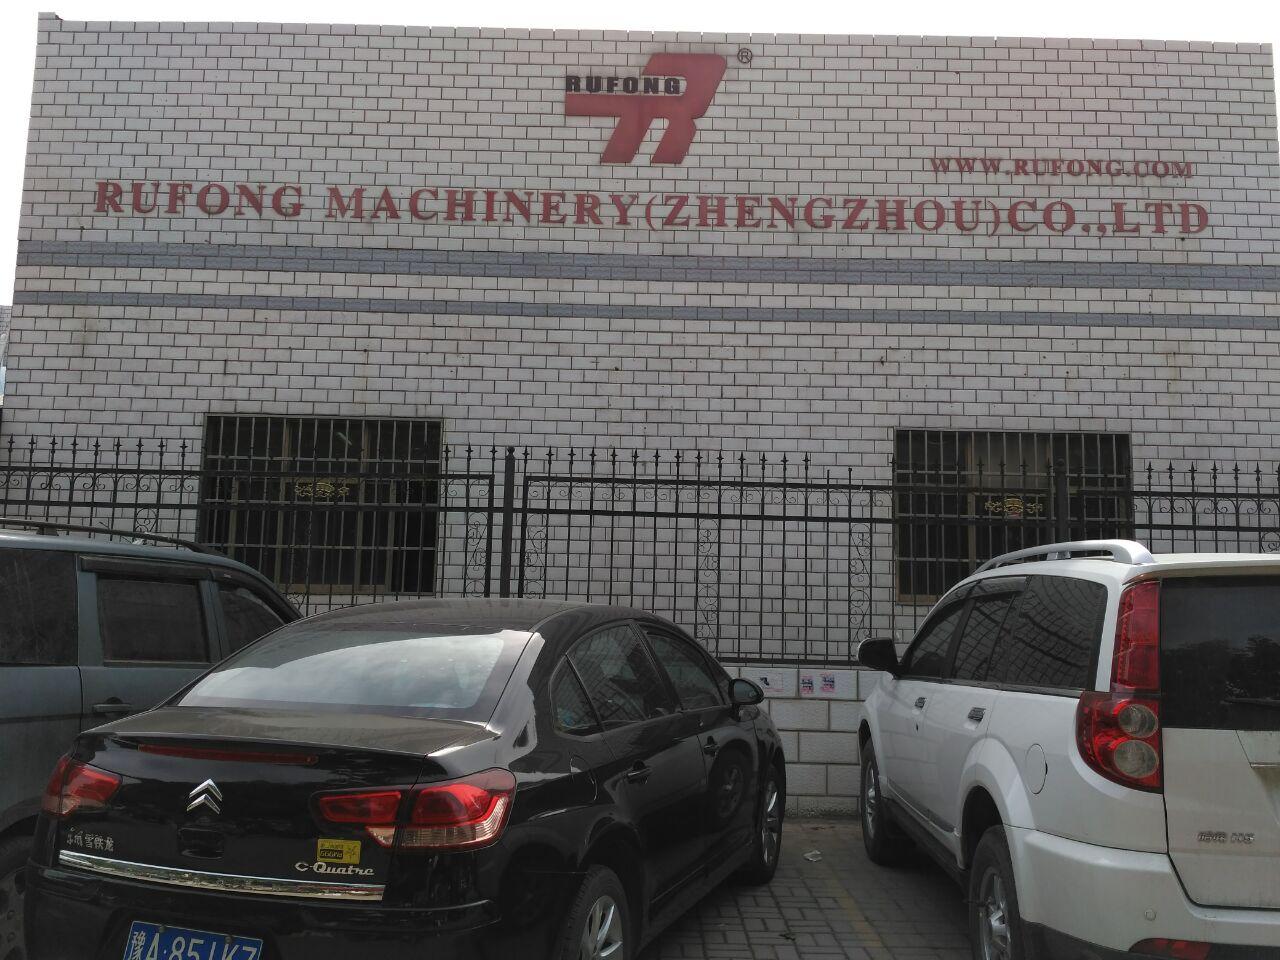 Rufong Machinery Co., Ltd. Main Image